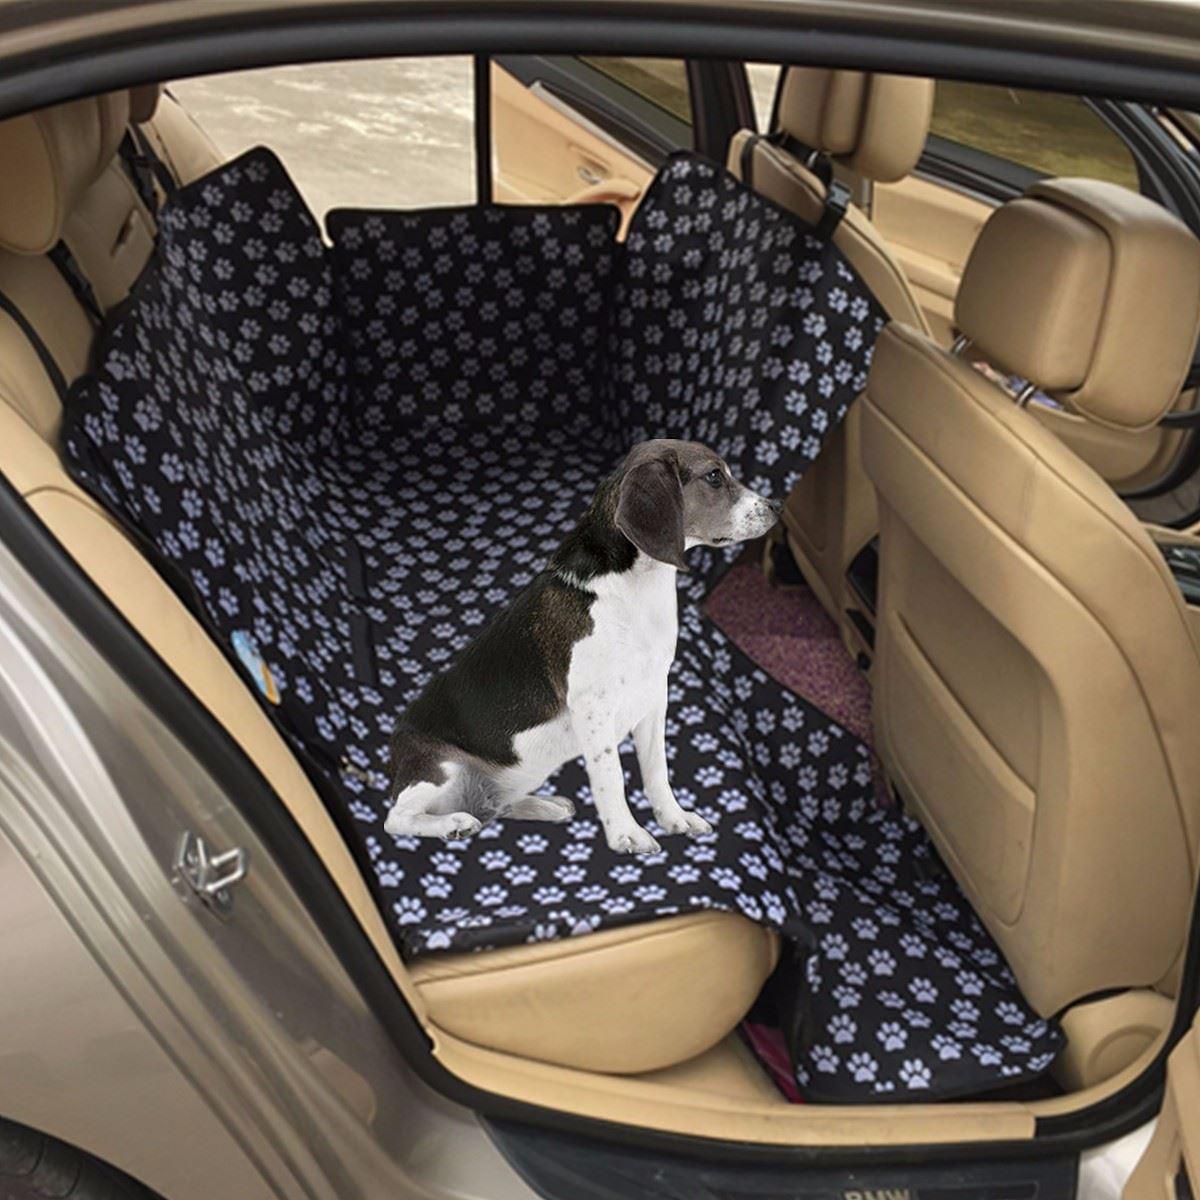 Auto Car Back Seat Cover Pet Dog Cat Mat Hammock Pet Carrier Safety Waterproof Dog Car Mats Footprint Protector 130 X 150 X 55cm